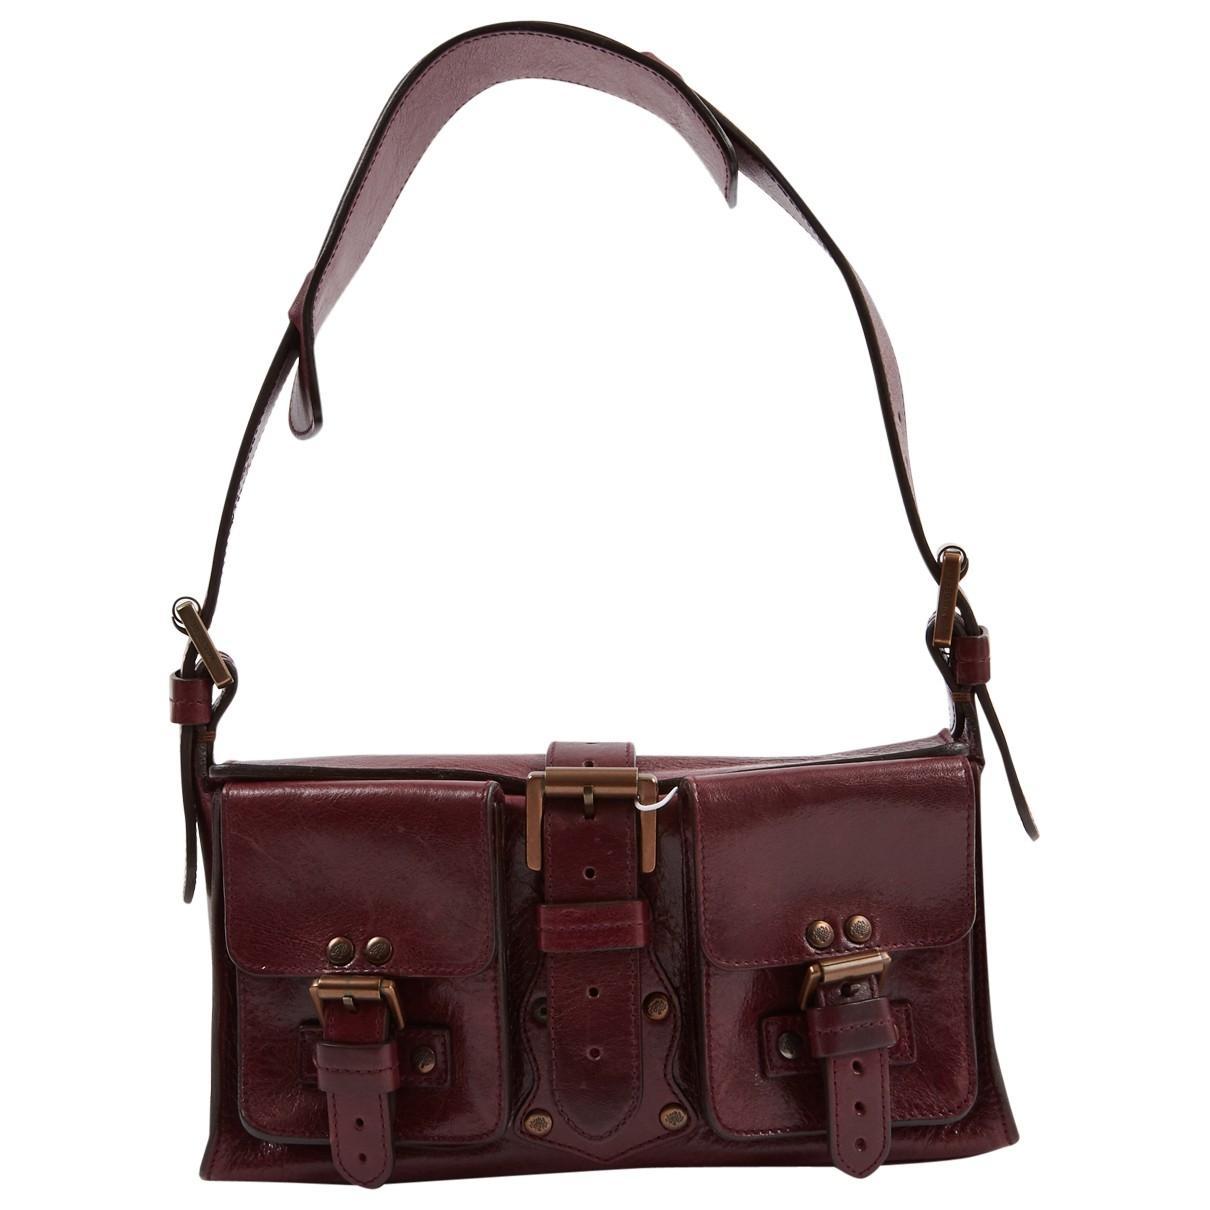 00b1eda9f7 Lyst - Mulberry Roxanne Leather Handbag in Purple